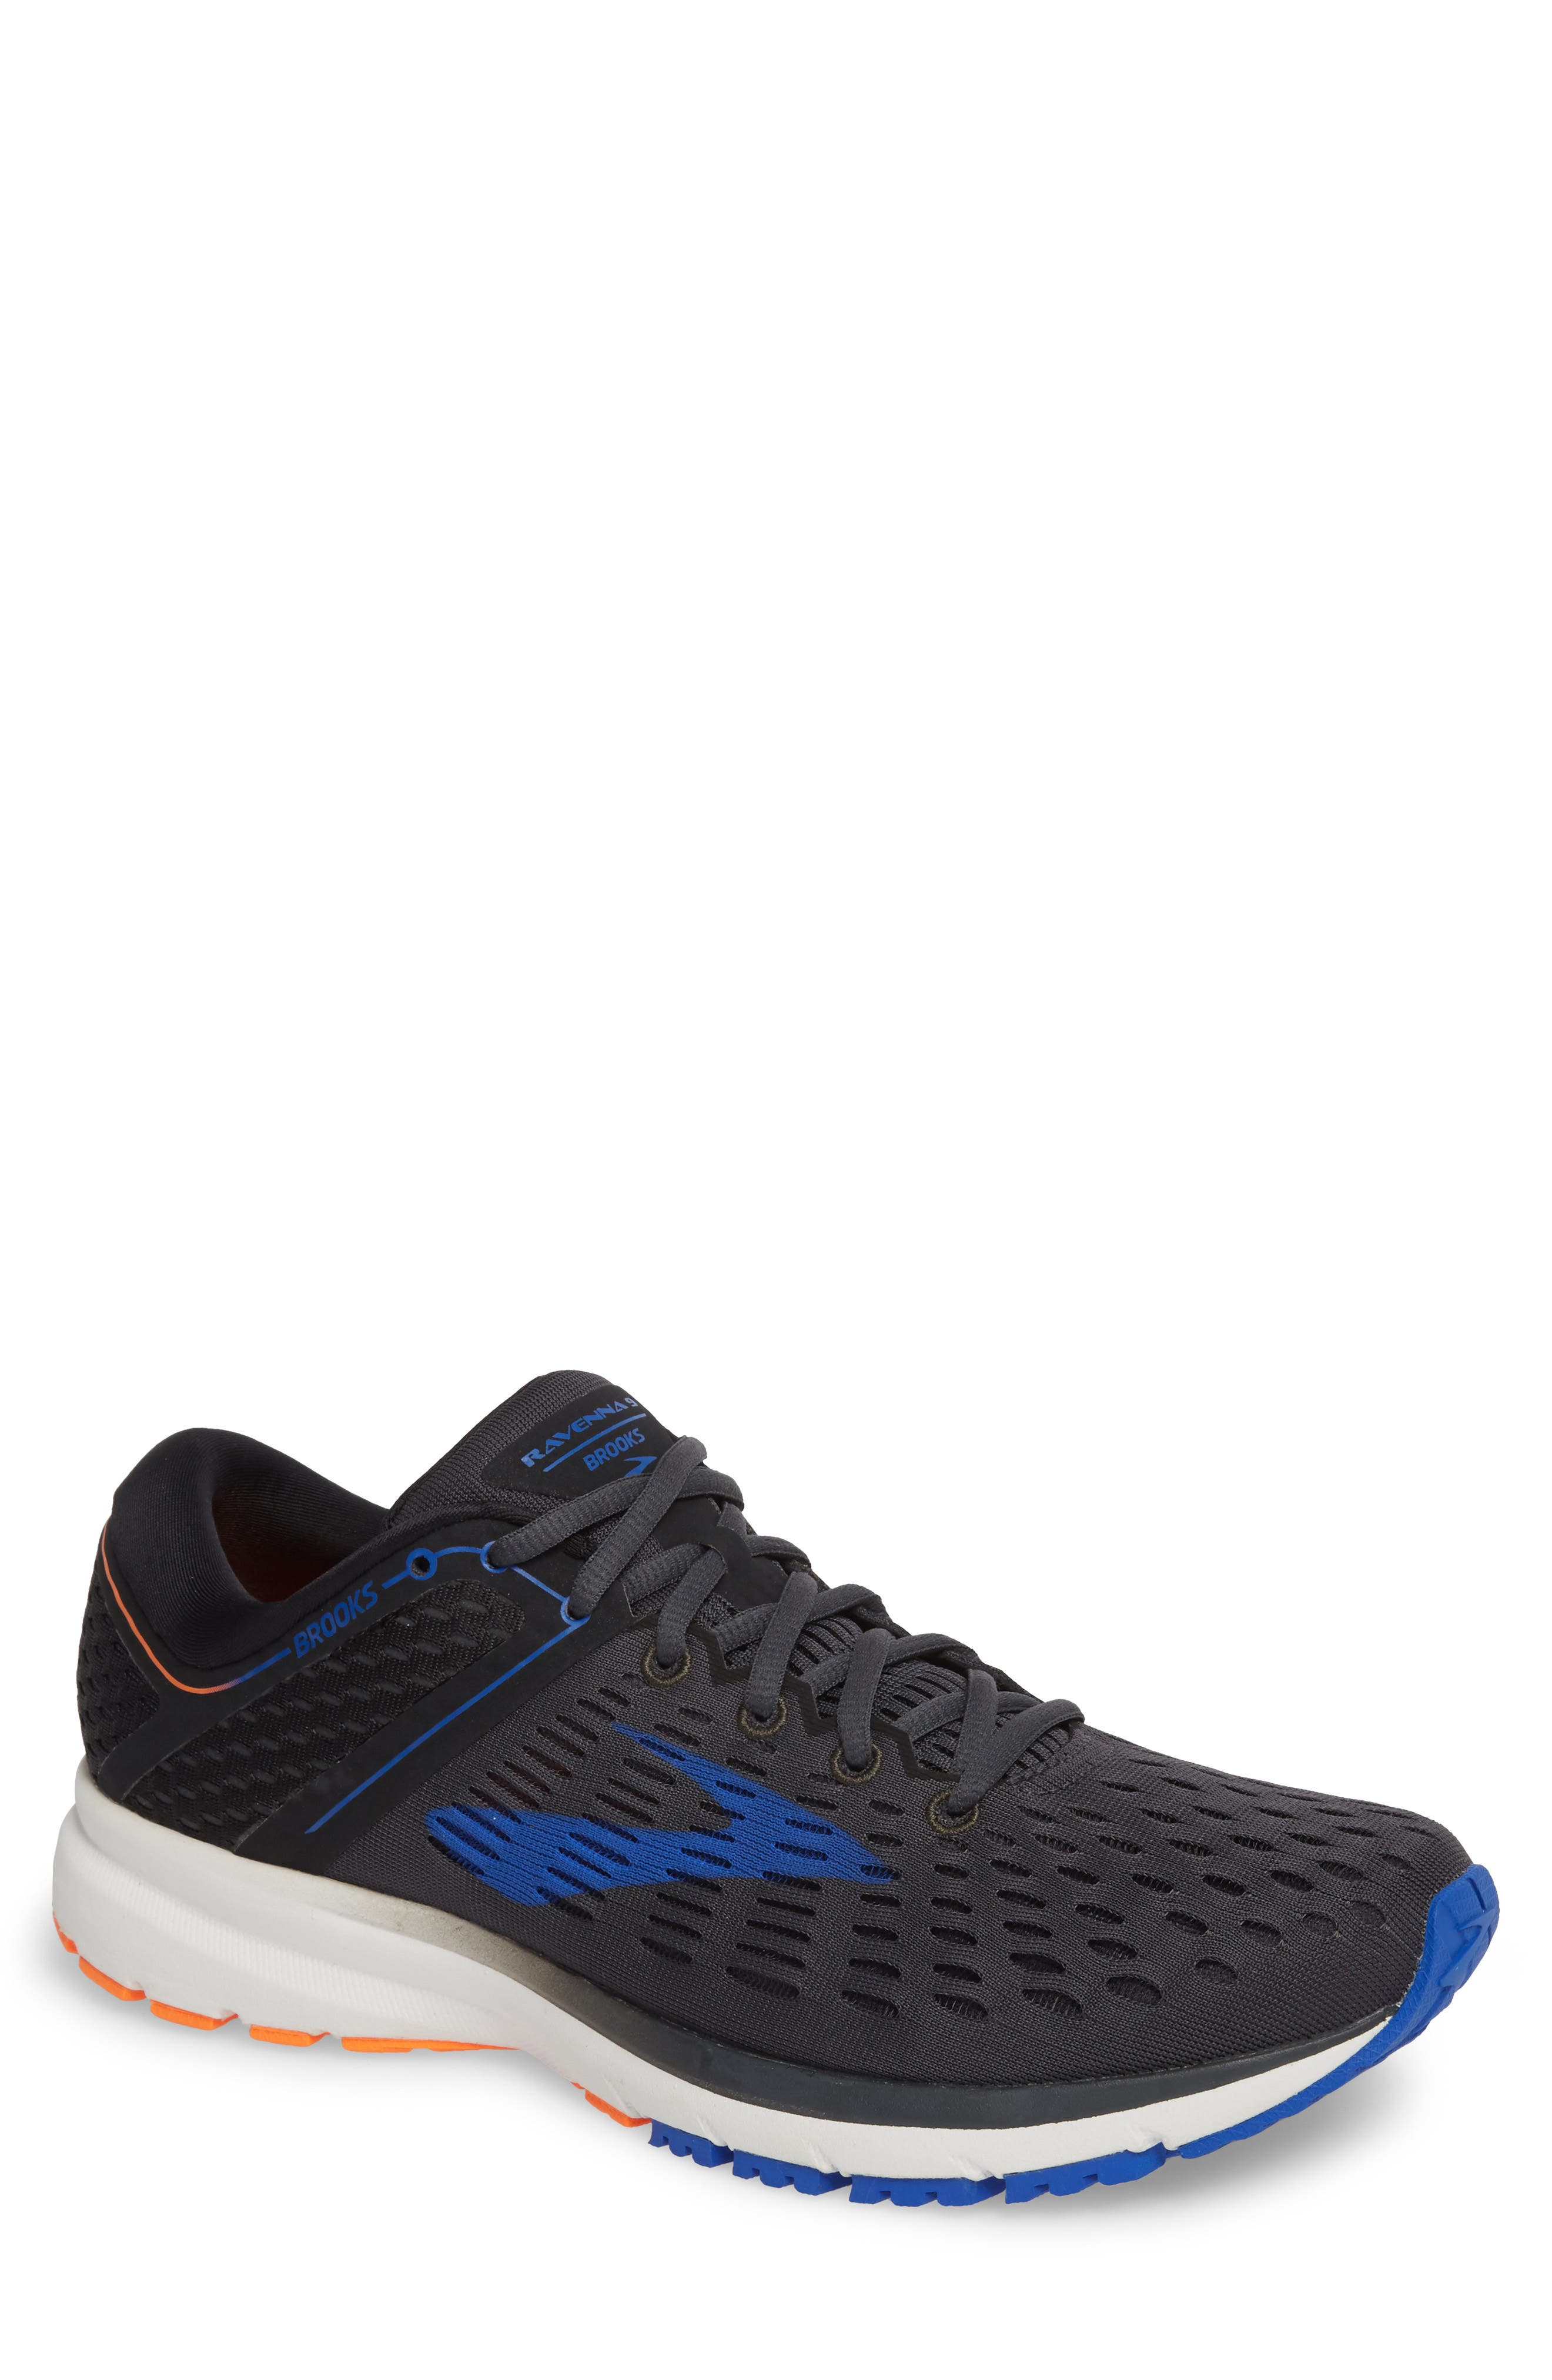 Ravenna 9 Running Shoe,                             Main thumbnail 1, color,                             EBONY/ BLUE/ ORANGE